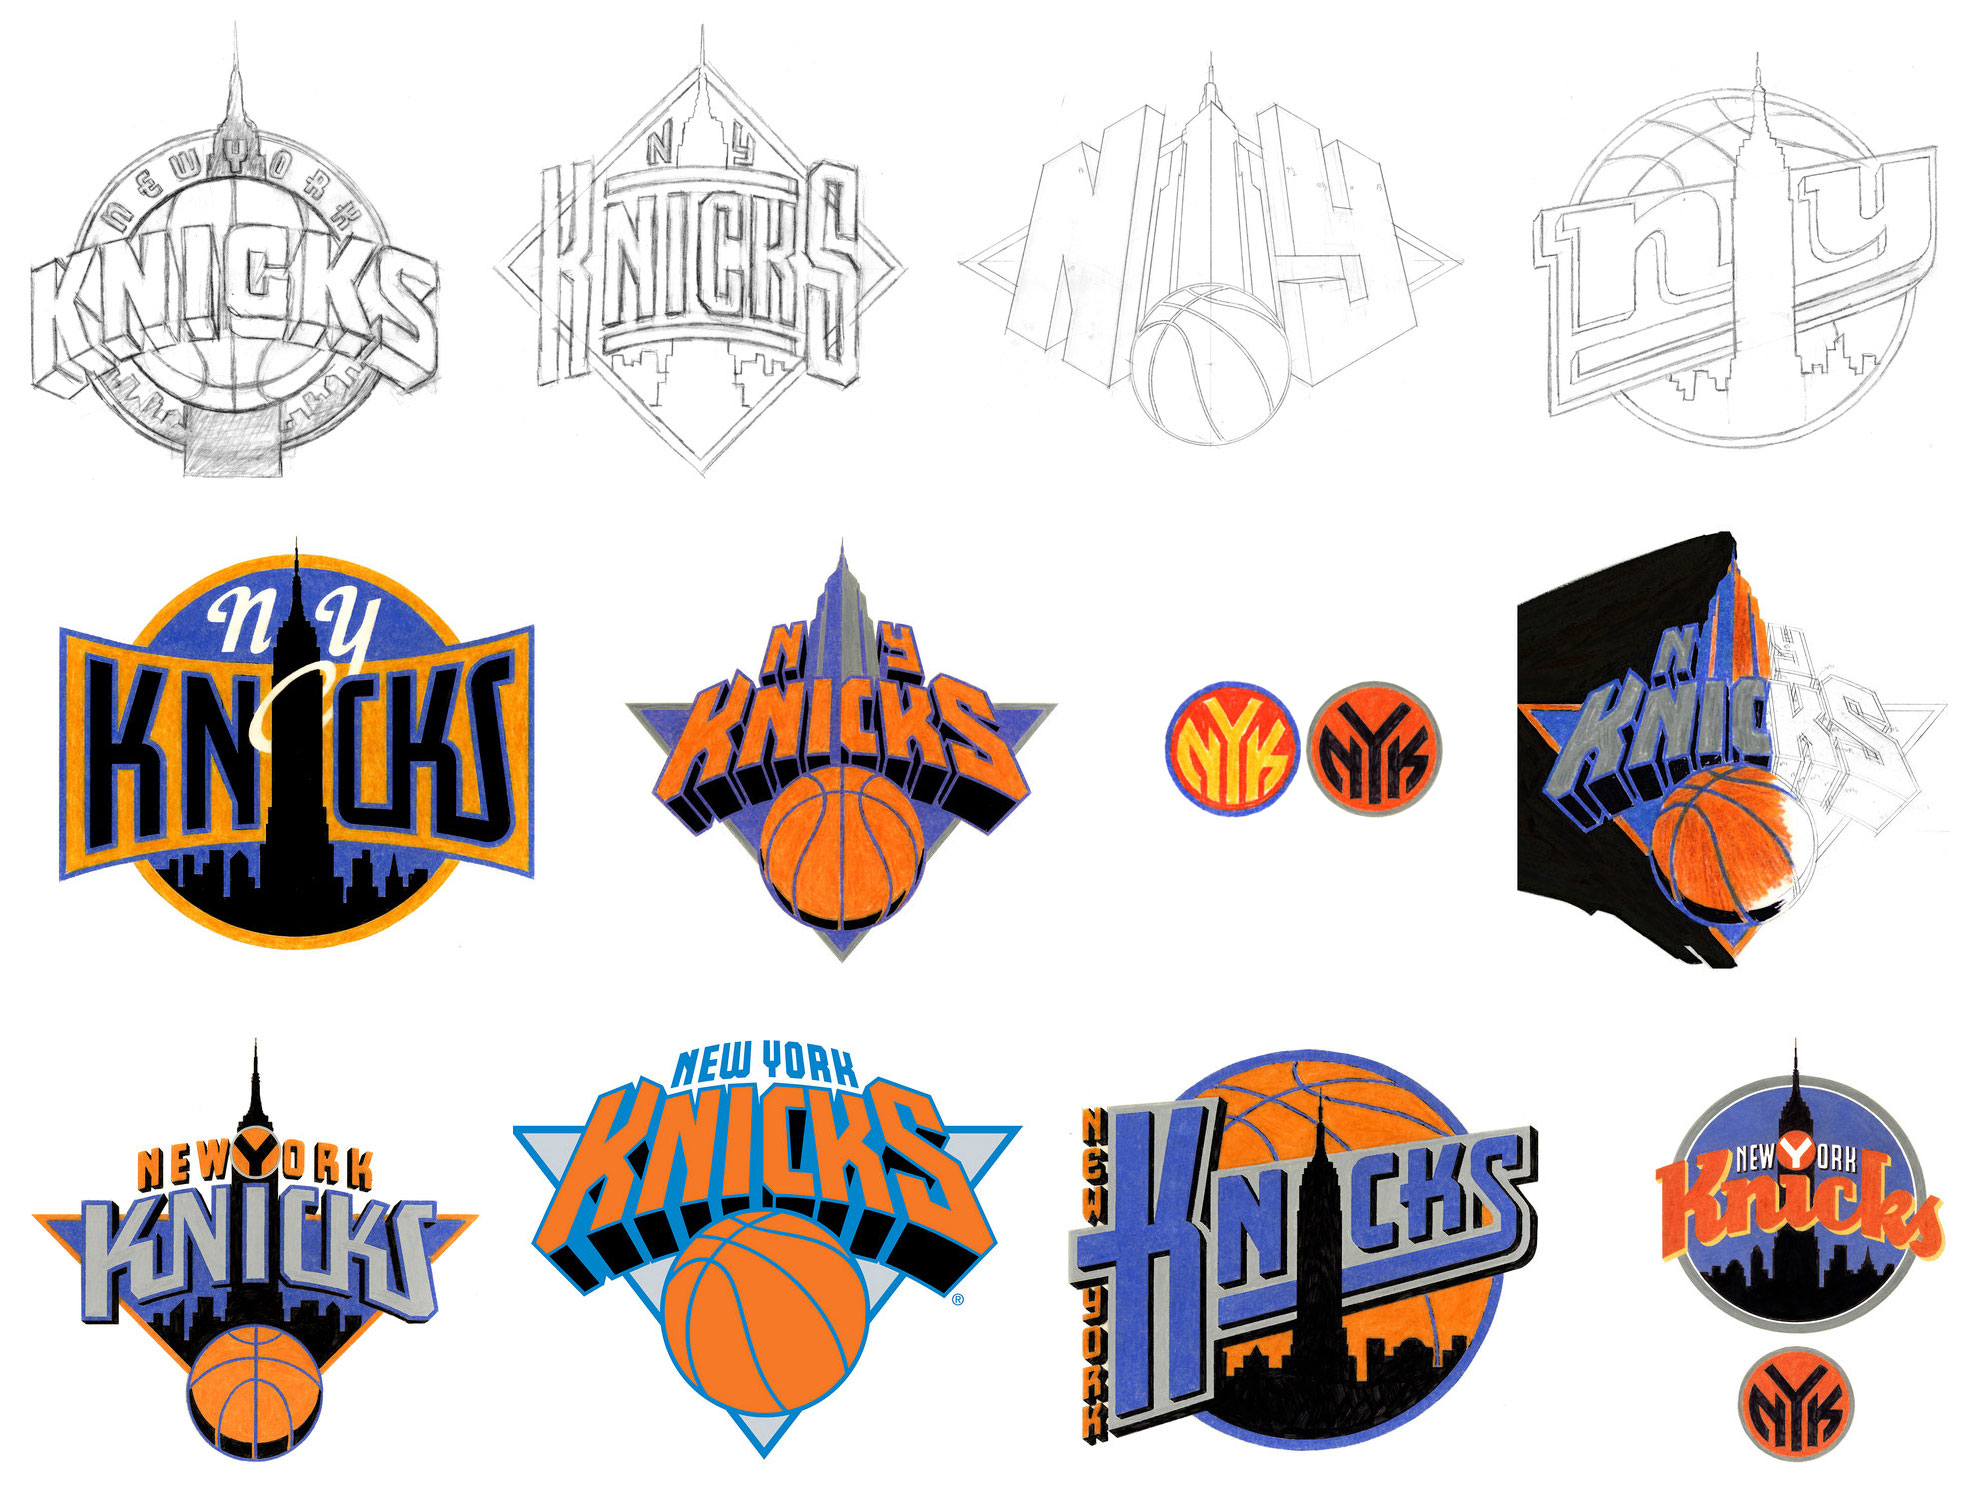 Nba Basketball New York Knicks: NEW YORK KNICKS Basketball Nba G Wallpaper